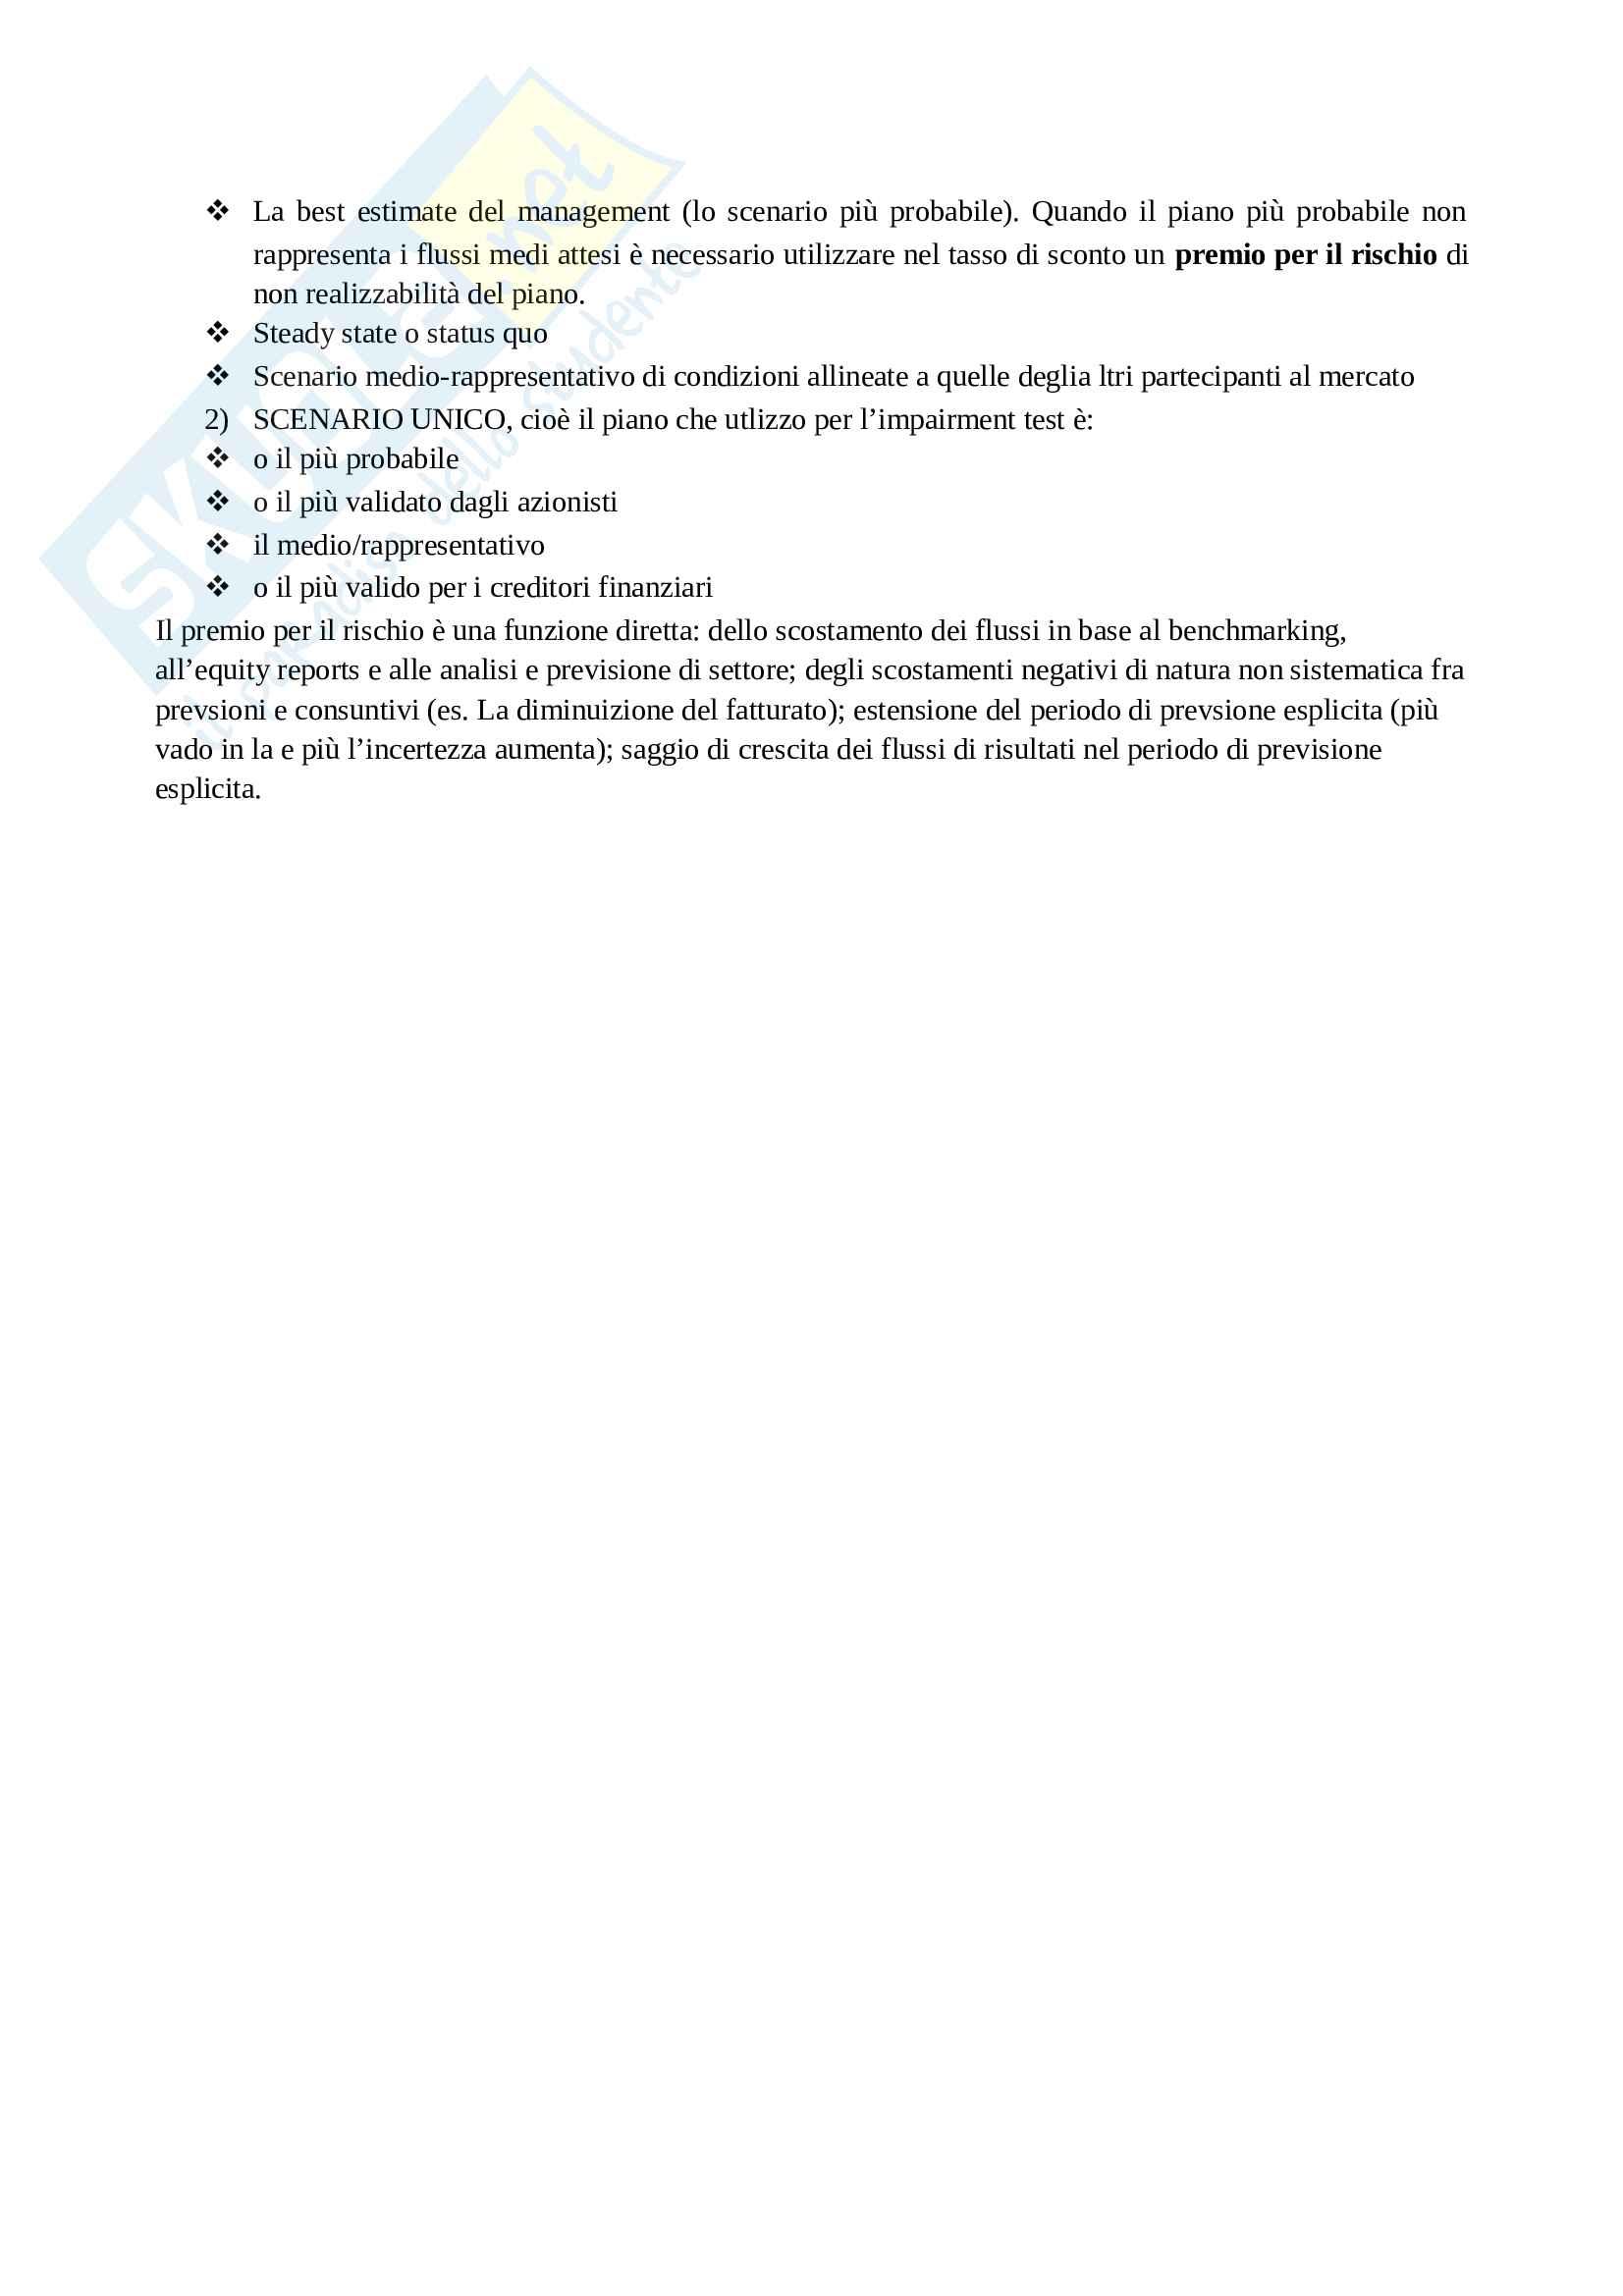 IAS corso progredito Pag. 36